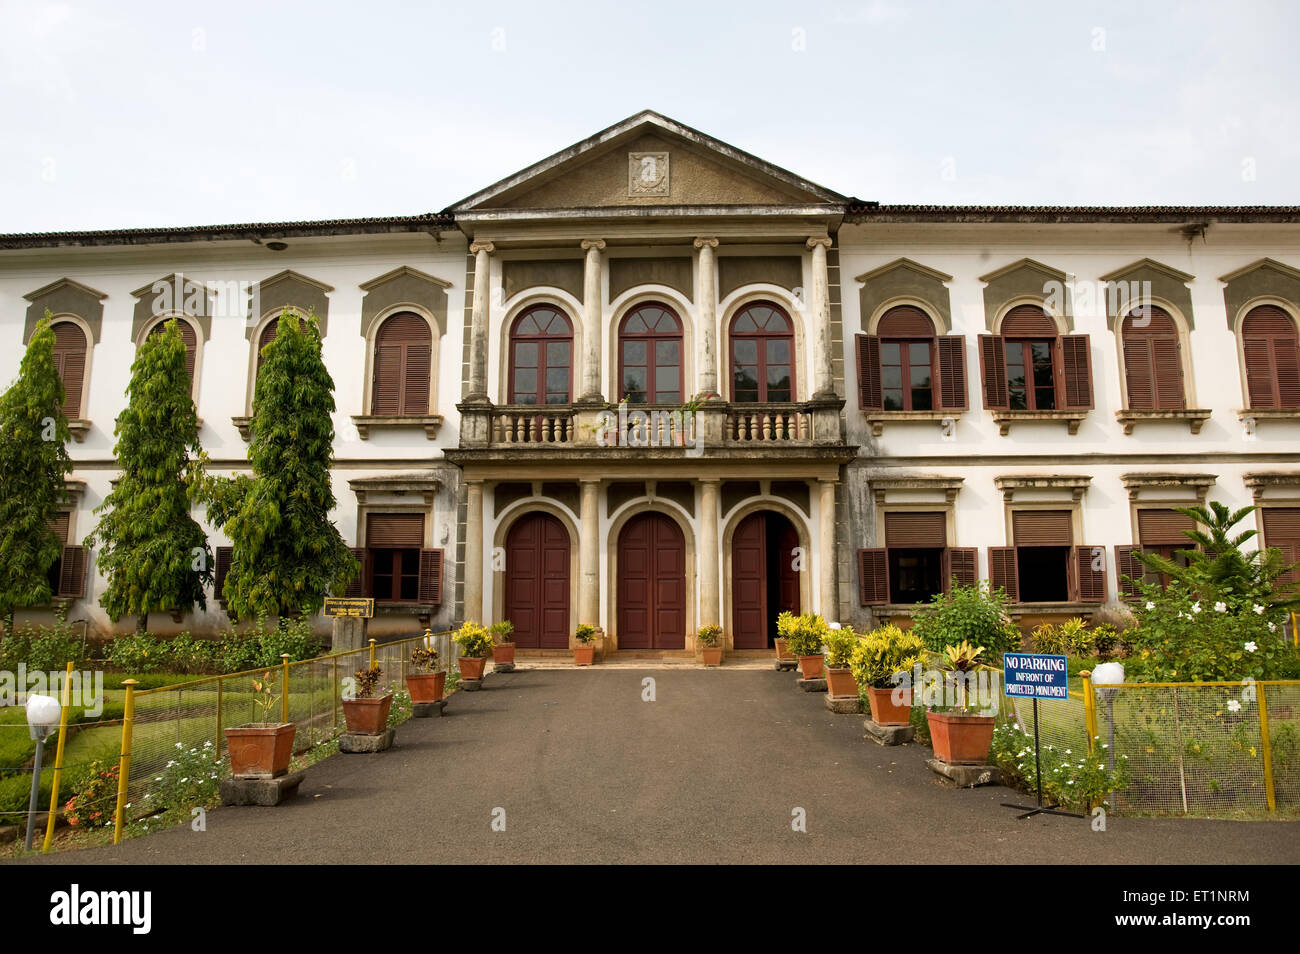 Church and pastoral institute at saint cajetan ; Old Goa ; India - Stock Image